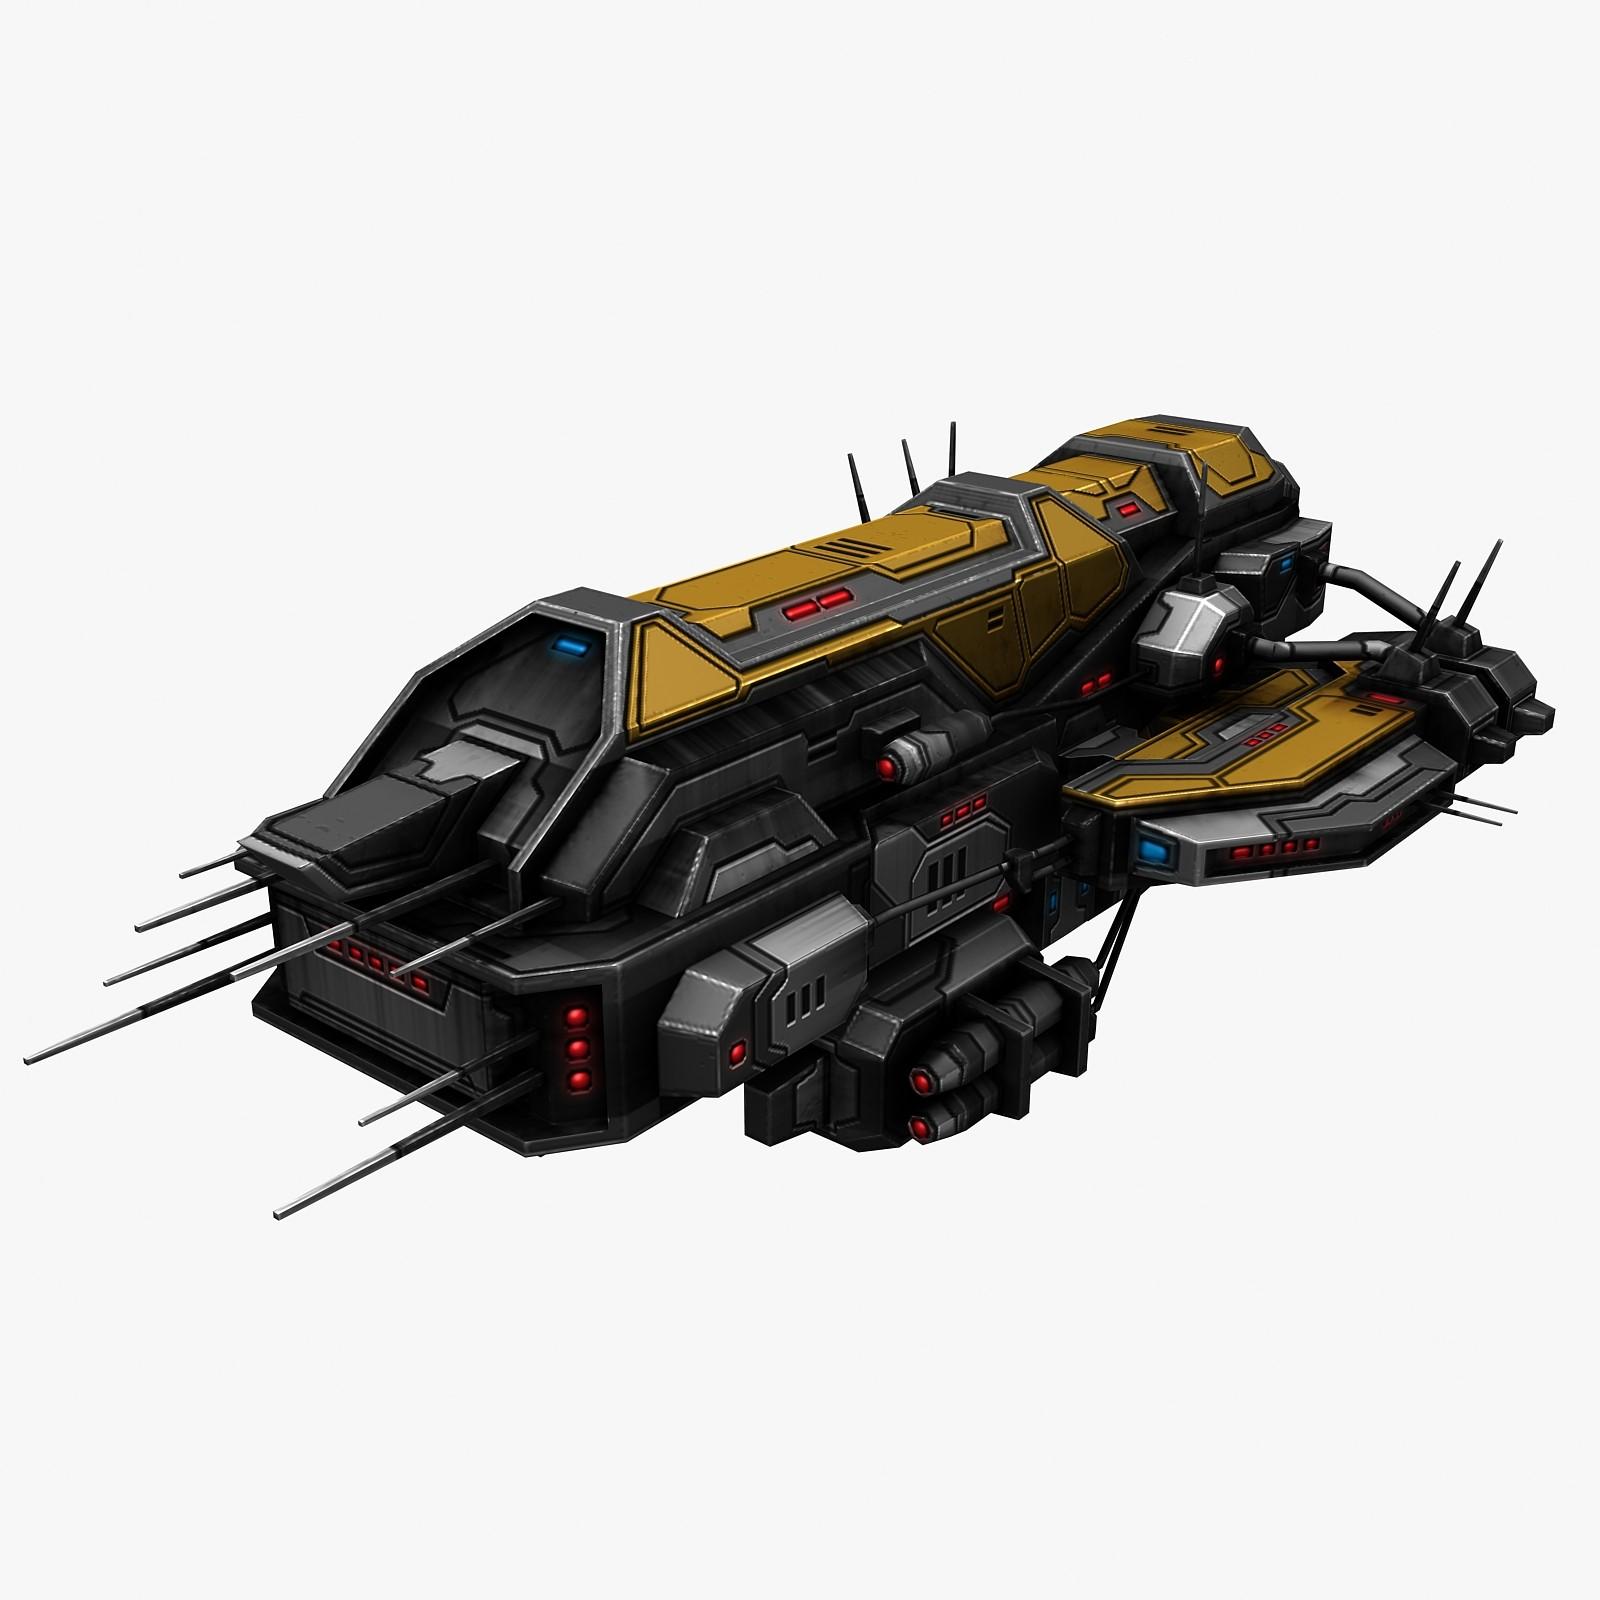 3d model of civilian spaceship